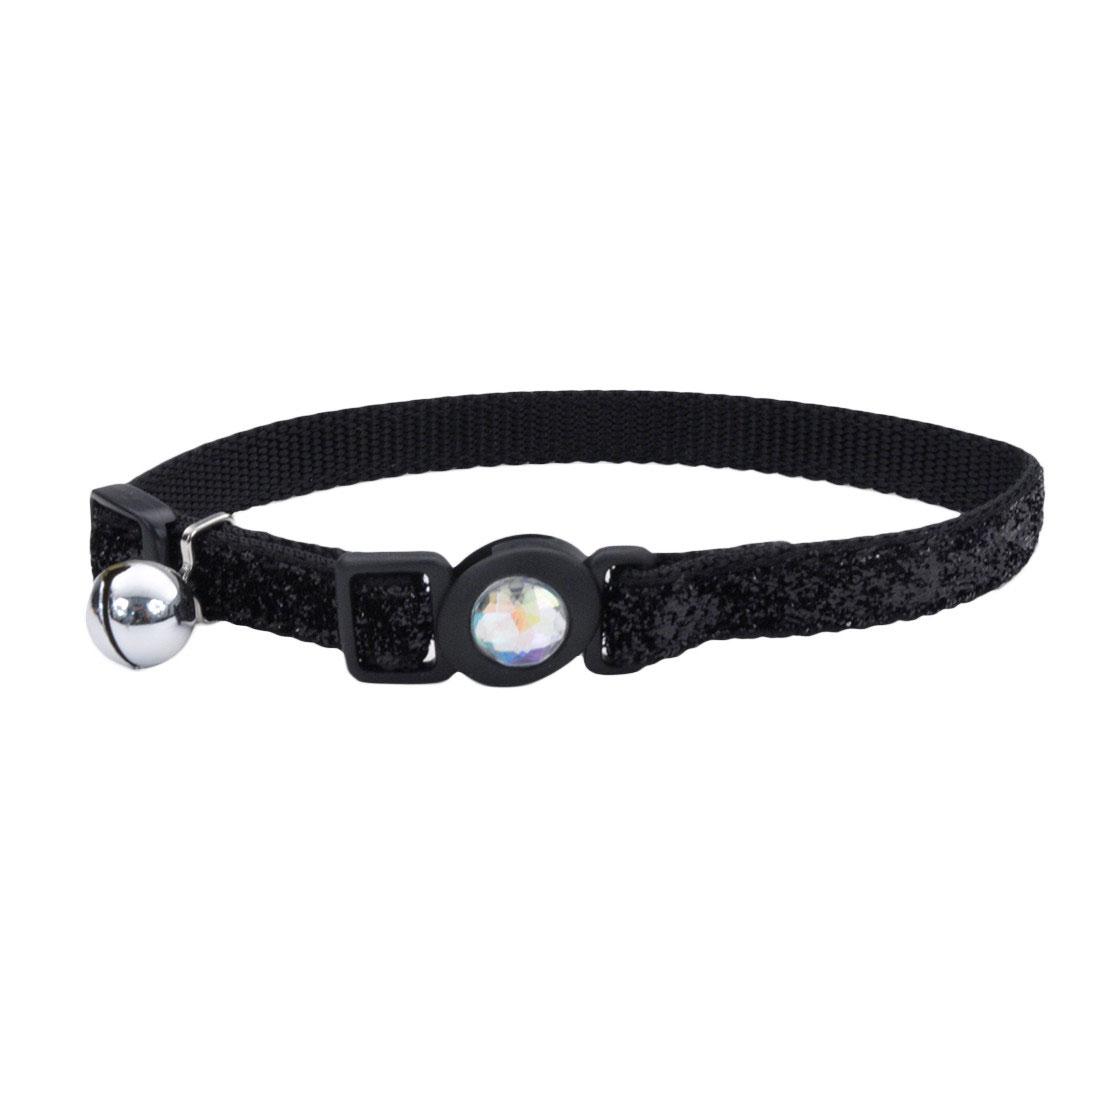 Safe Cat Jeweled Buckle Adjustable Breakaway Cat Collar with Glitter Overlay, Black Image